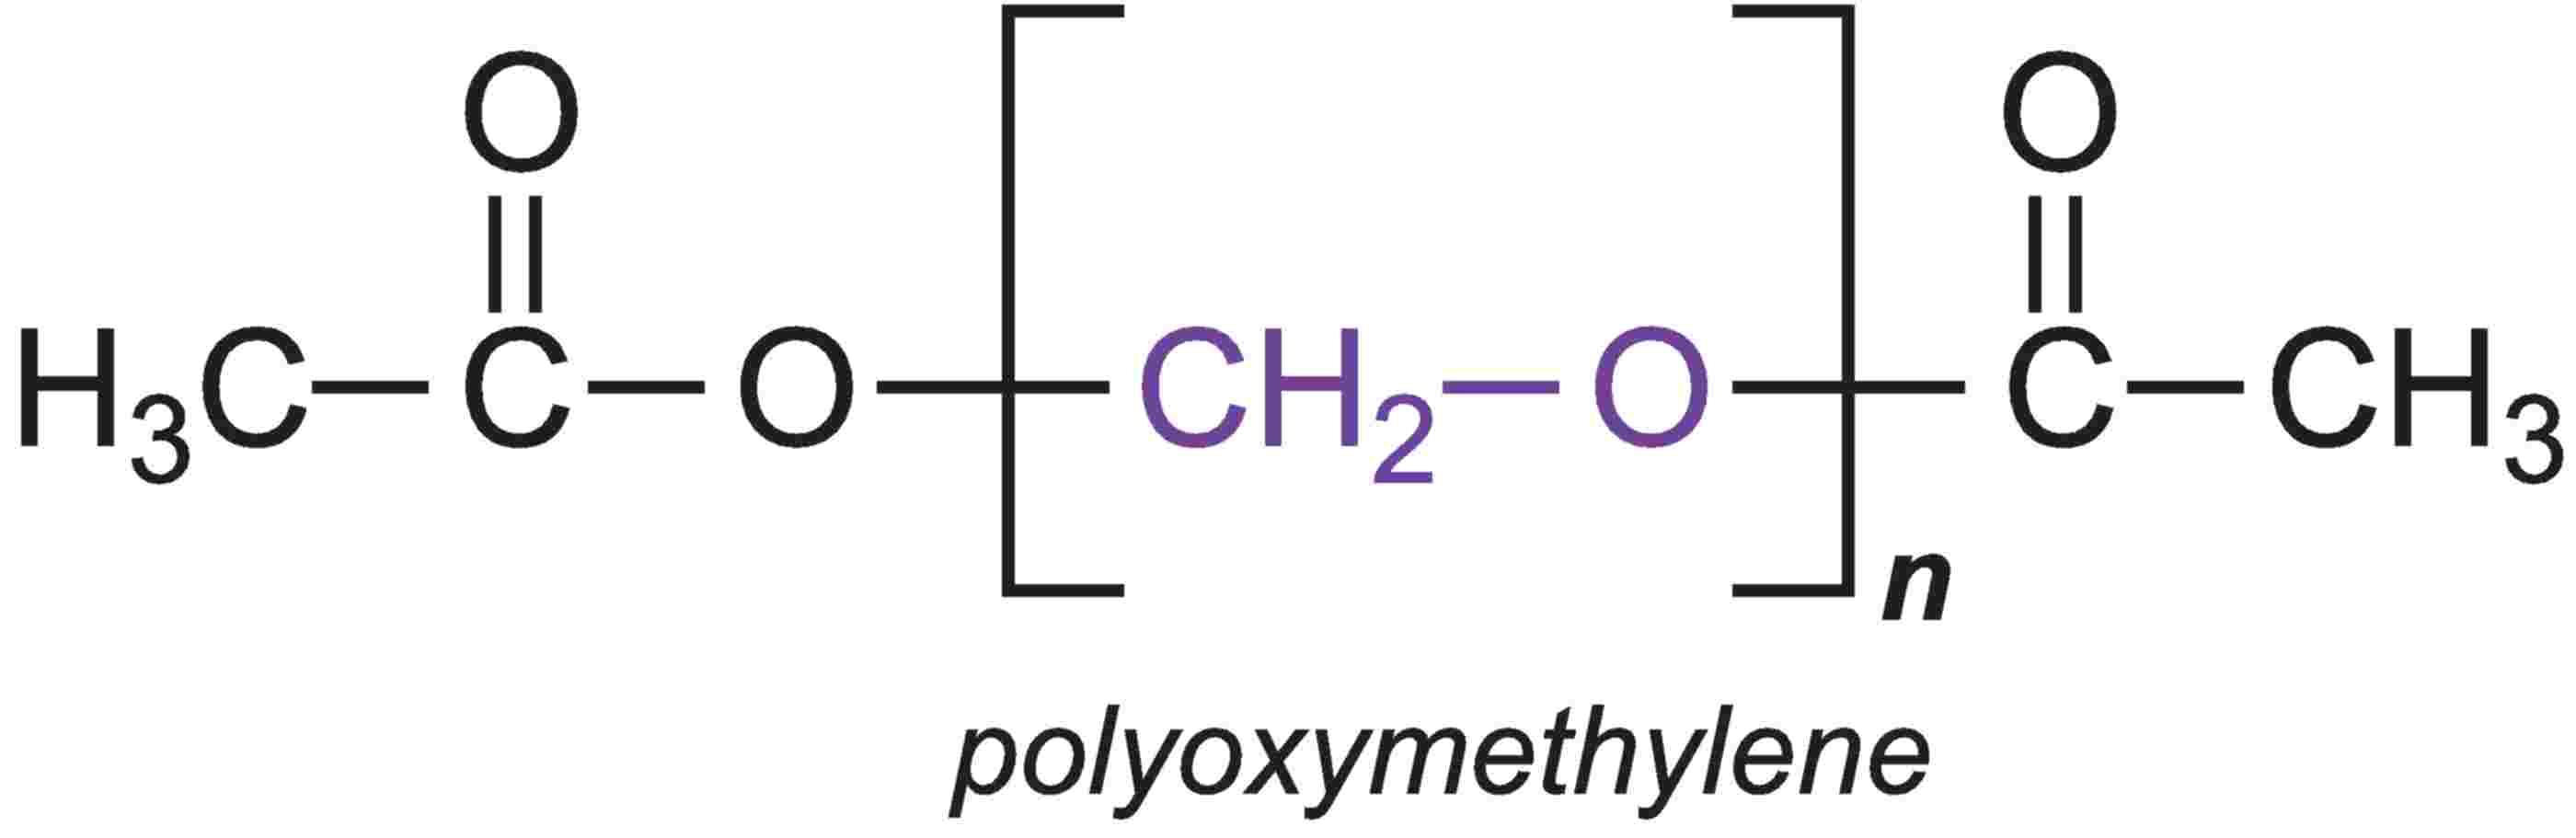 Methanal Formaldehyde